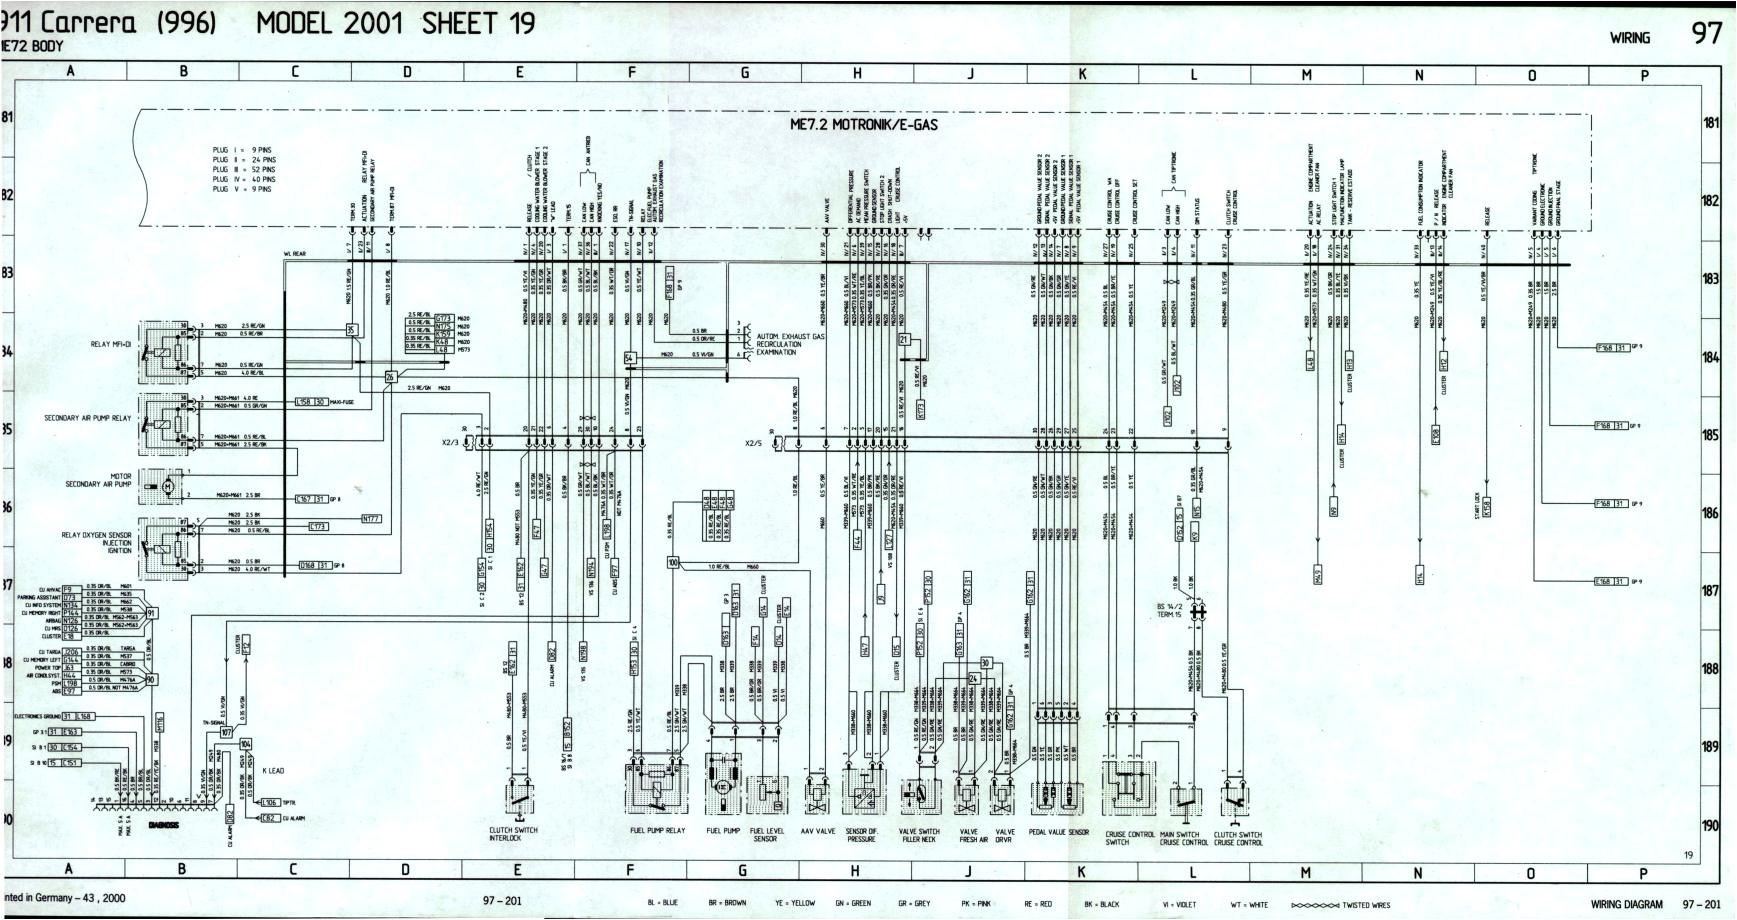 1972 porsche 911 wiring diagram 1966 harness custom